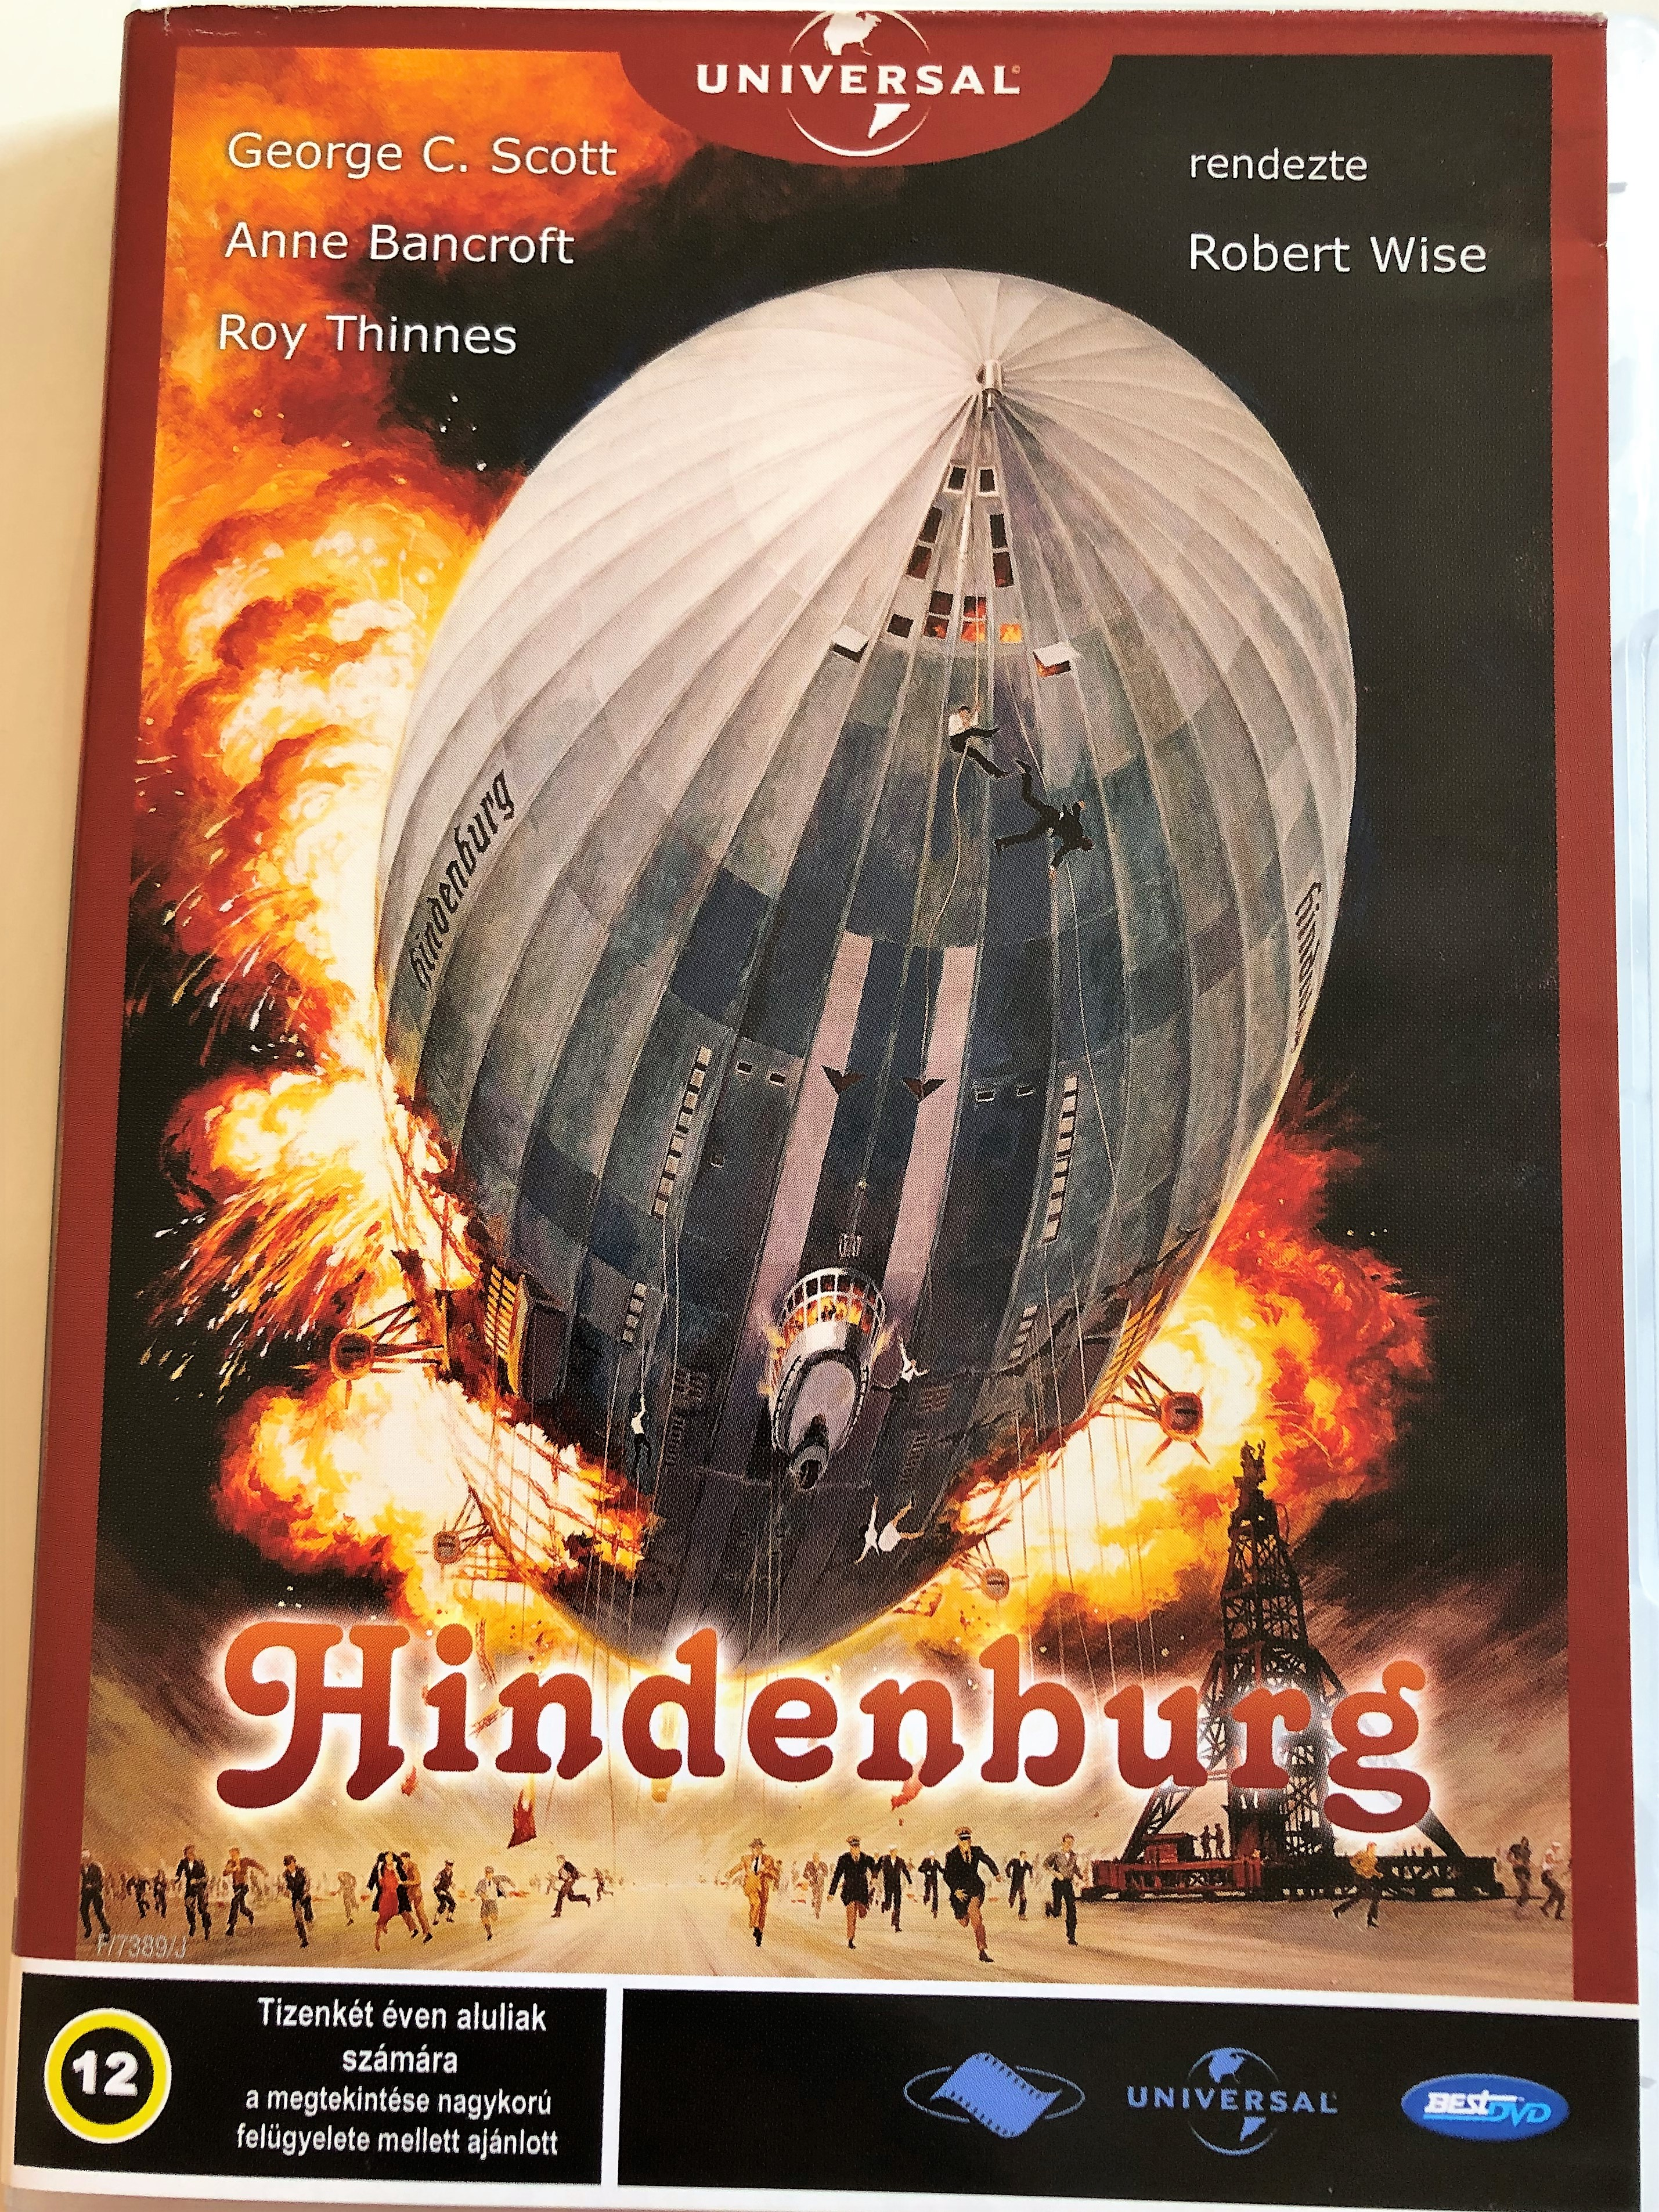 hindenburg-dvd-1975-the-hindenburg-directed-by-robert-wise-starring-george-c.-scott-anne-bancroft-roy-thinnes-1-.jpg